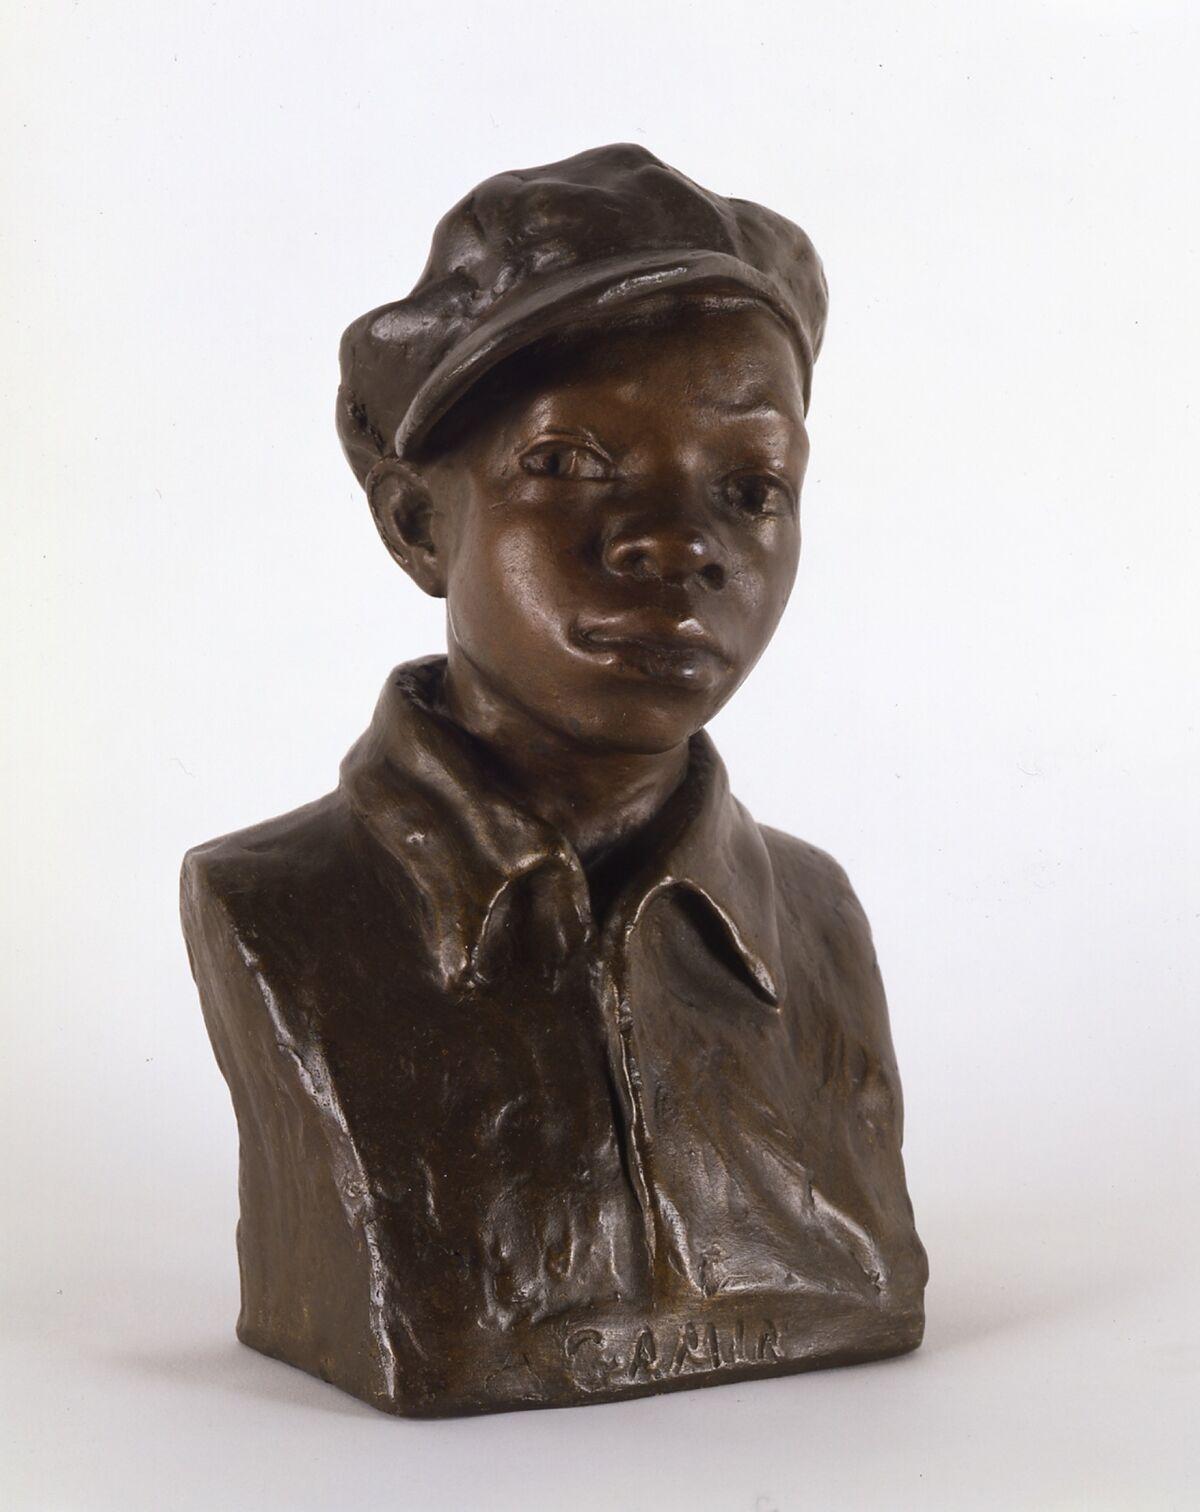 Augusta Savage, Gamin, c. 1930. Courtesy of the Cummer Museum of Art & Gardens, Jacksonville, Florida.